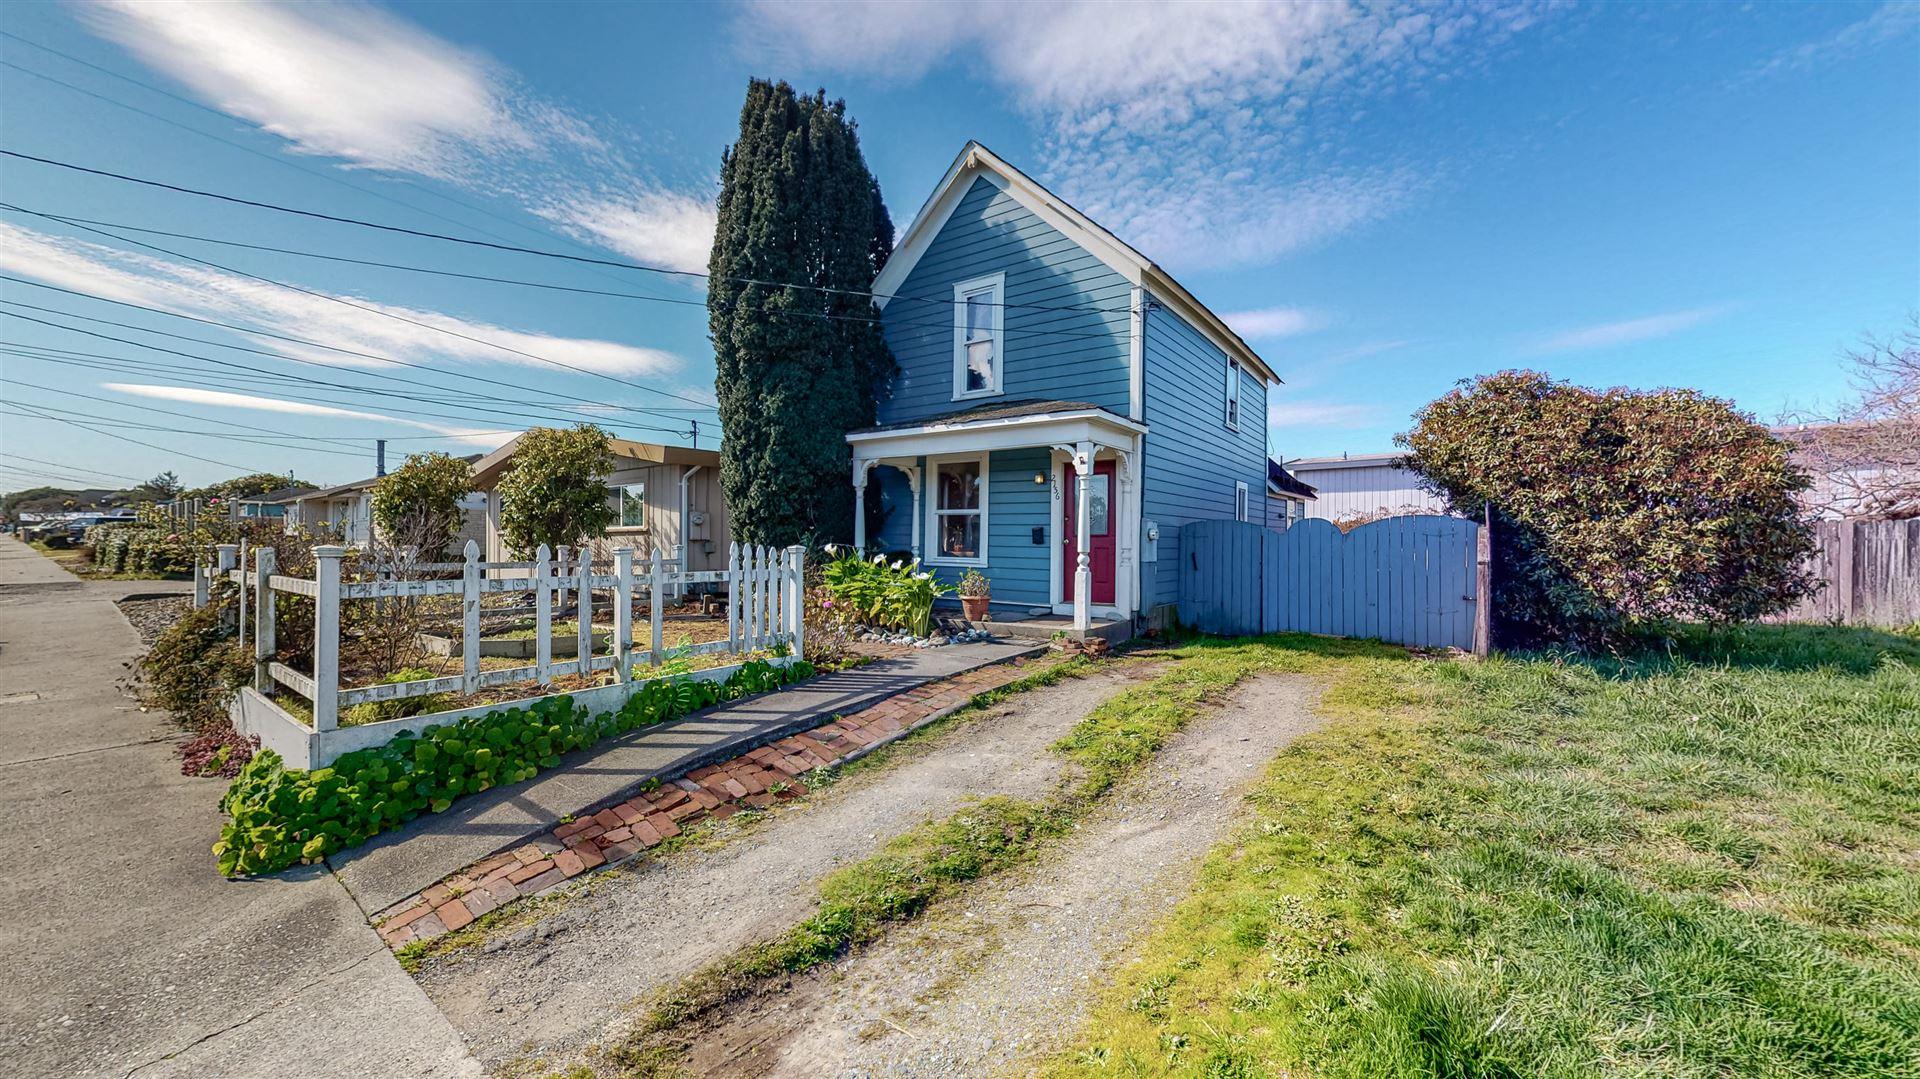 2156 Pine Street, Eureka, CA 95501 - MLS#: 258437